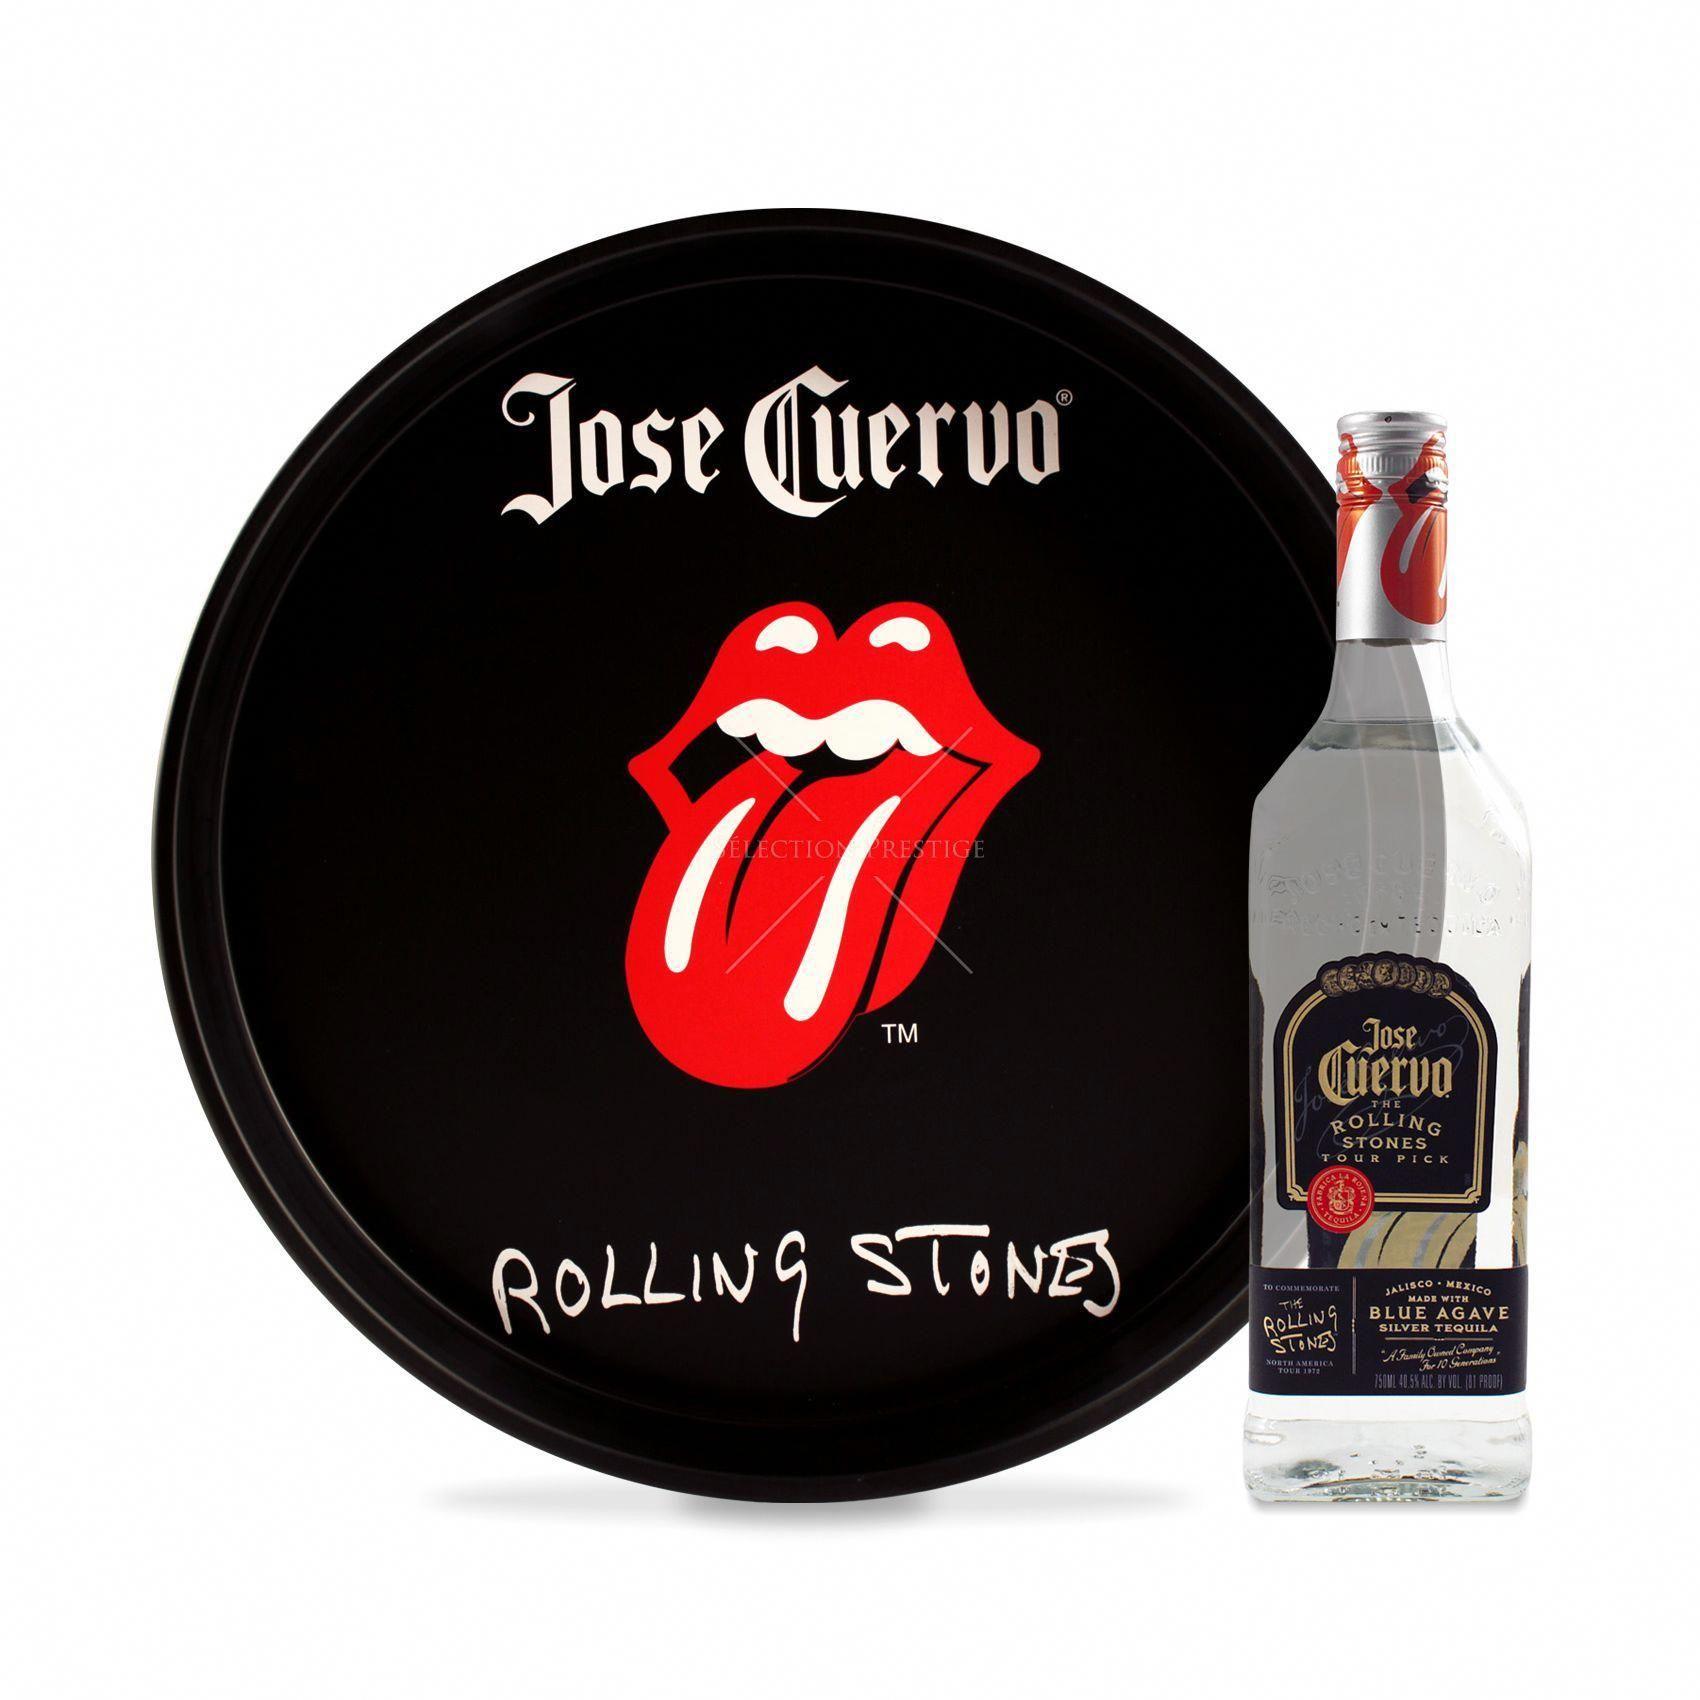 Jose cuervo rolling stones edition 07l 38 vol tray